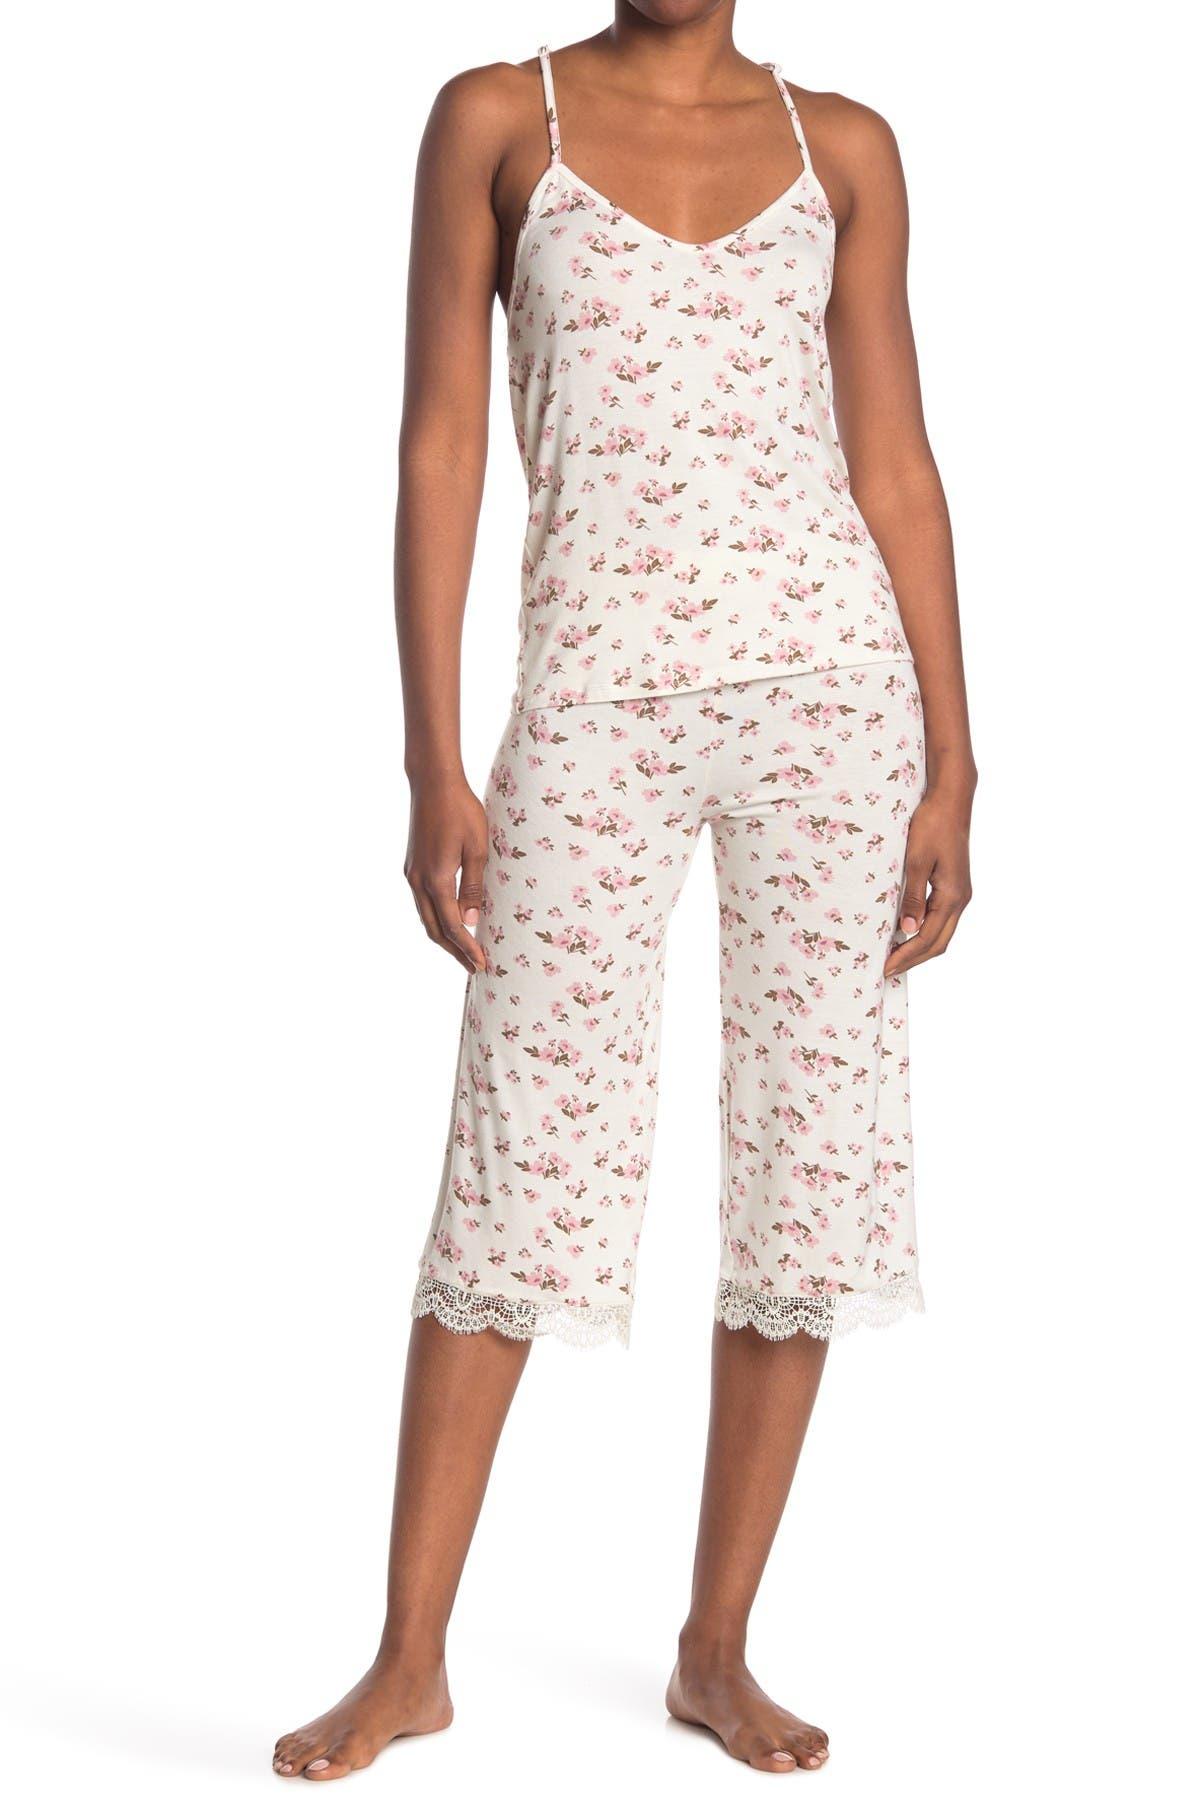 Image of COZY ROZY Just Bloom Lace Trim Camisole & Pants 2-Piece Pajama Set